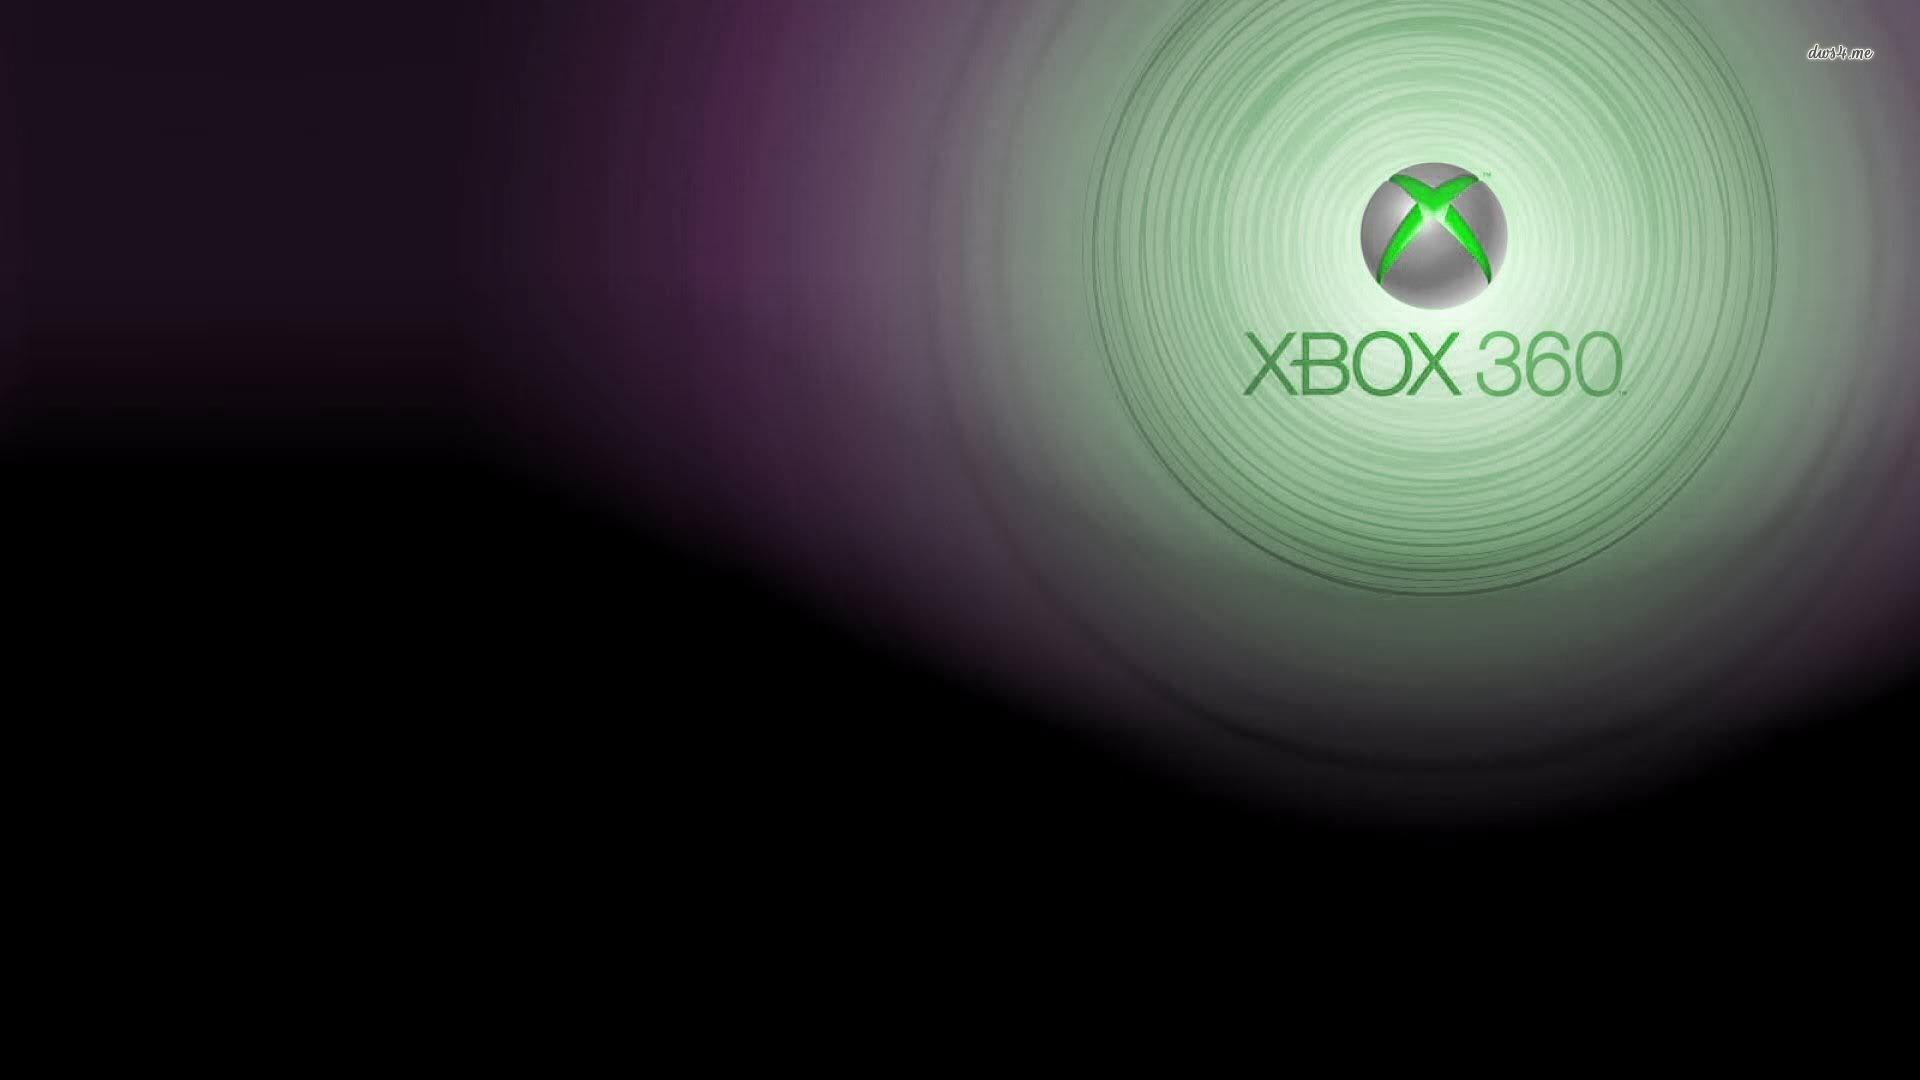 Xbox 360 wallpaper 1920x1080